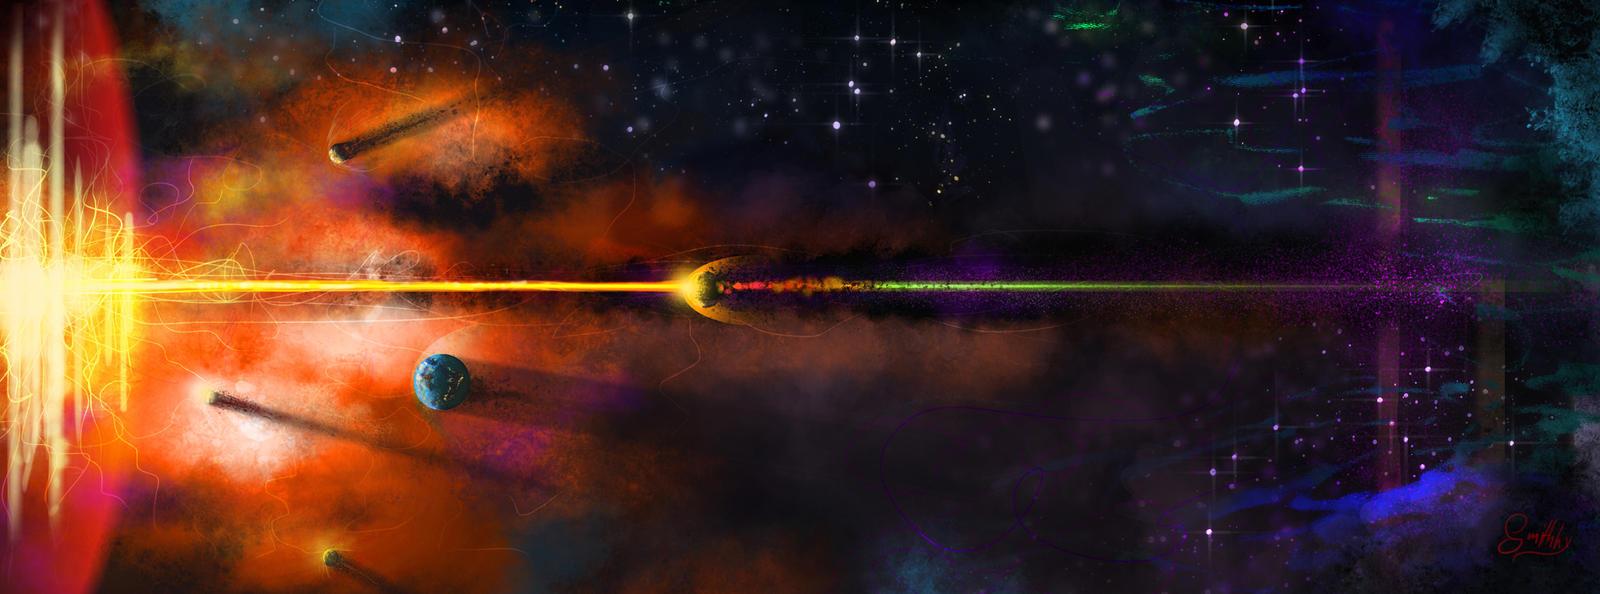 End of a Solar System by Sverrirorz on DeviantArt